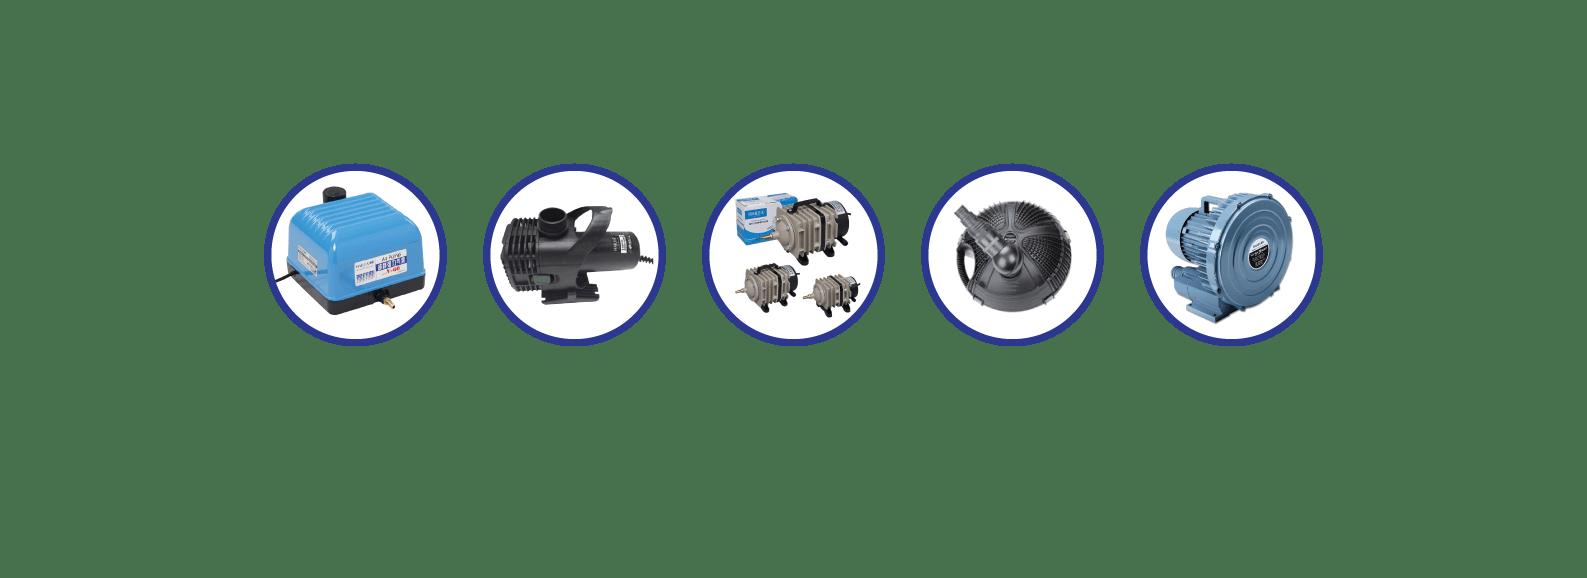 Hailea Product Range | Pool Spa & Filtration Supplies